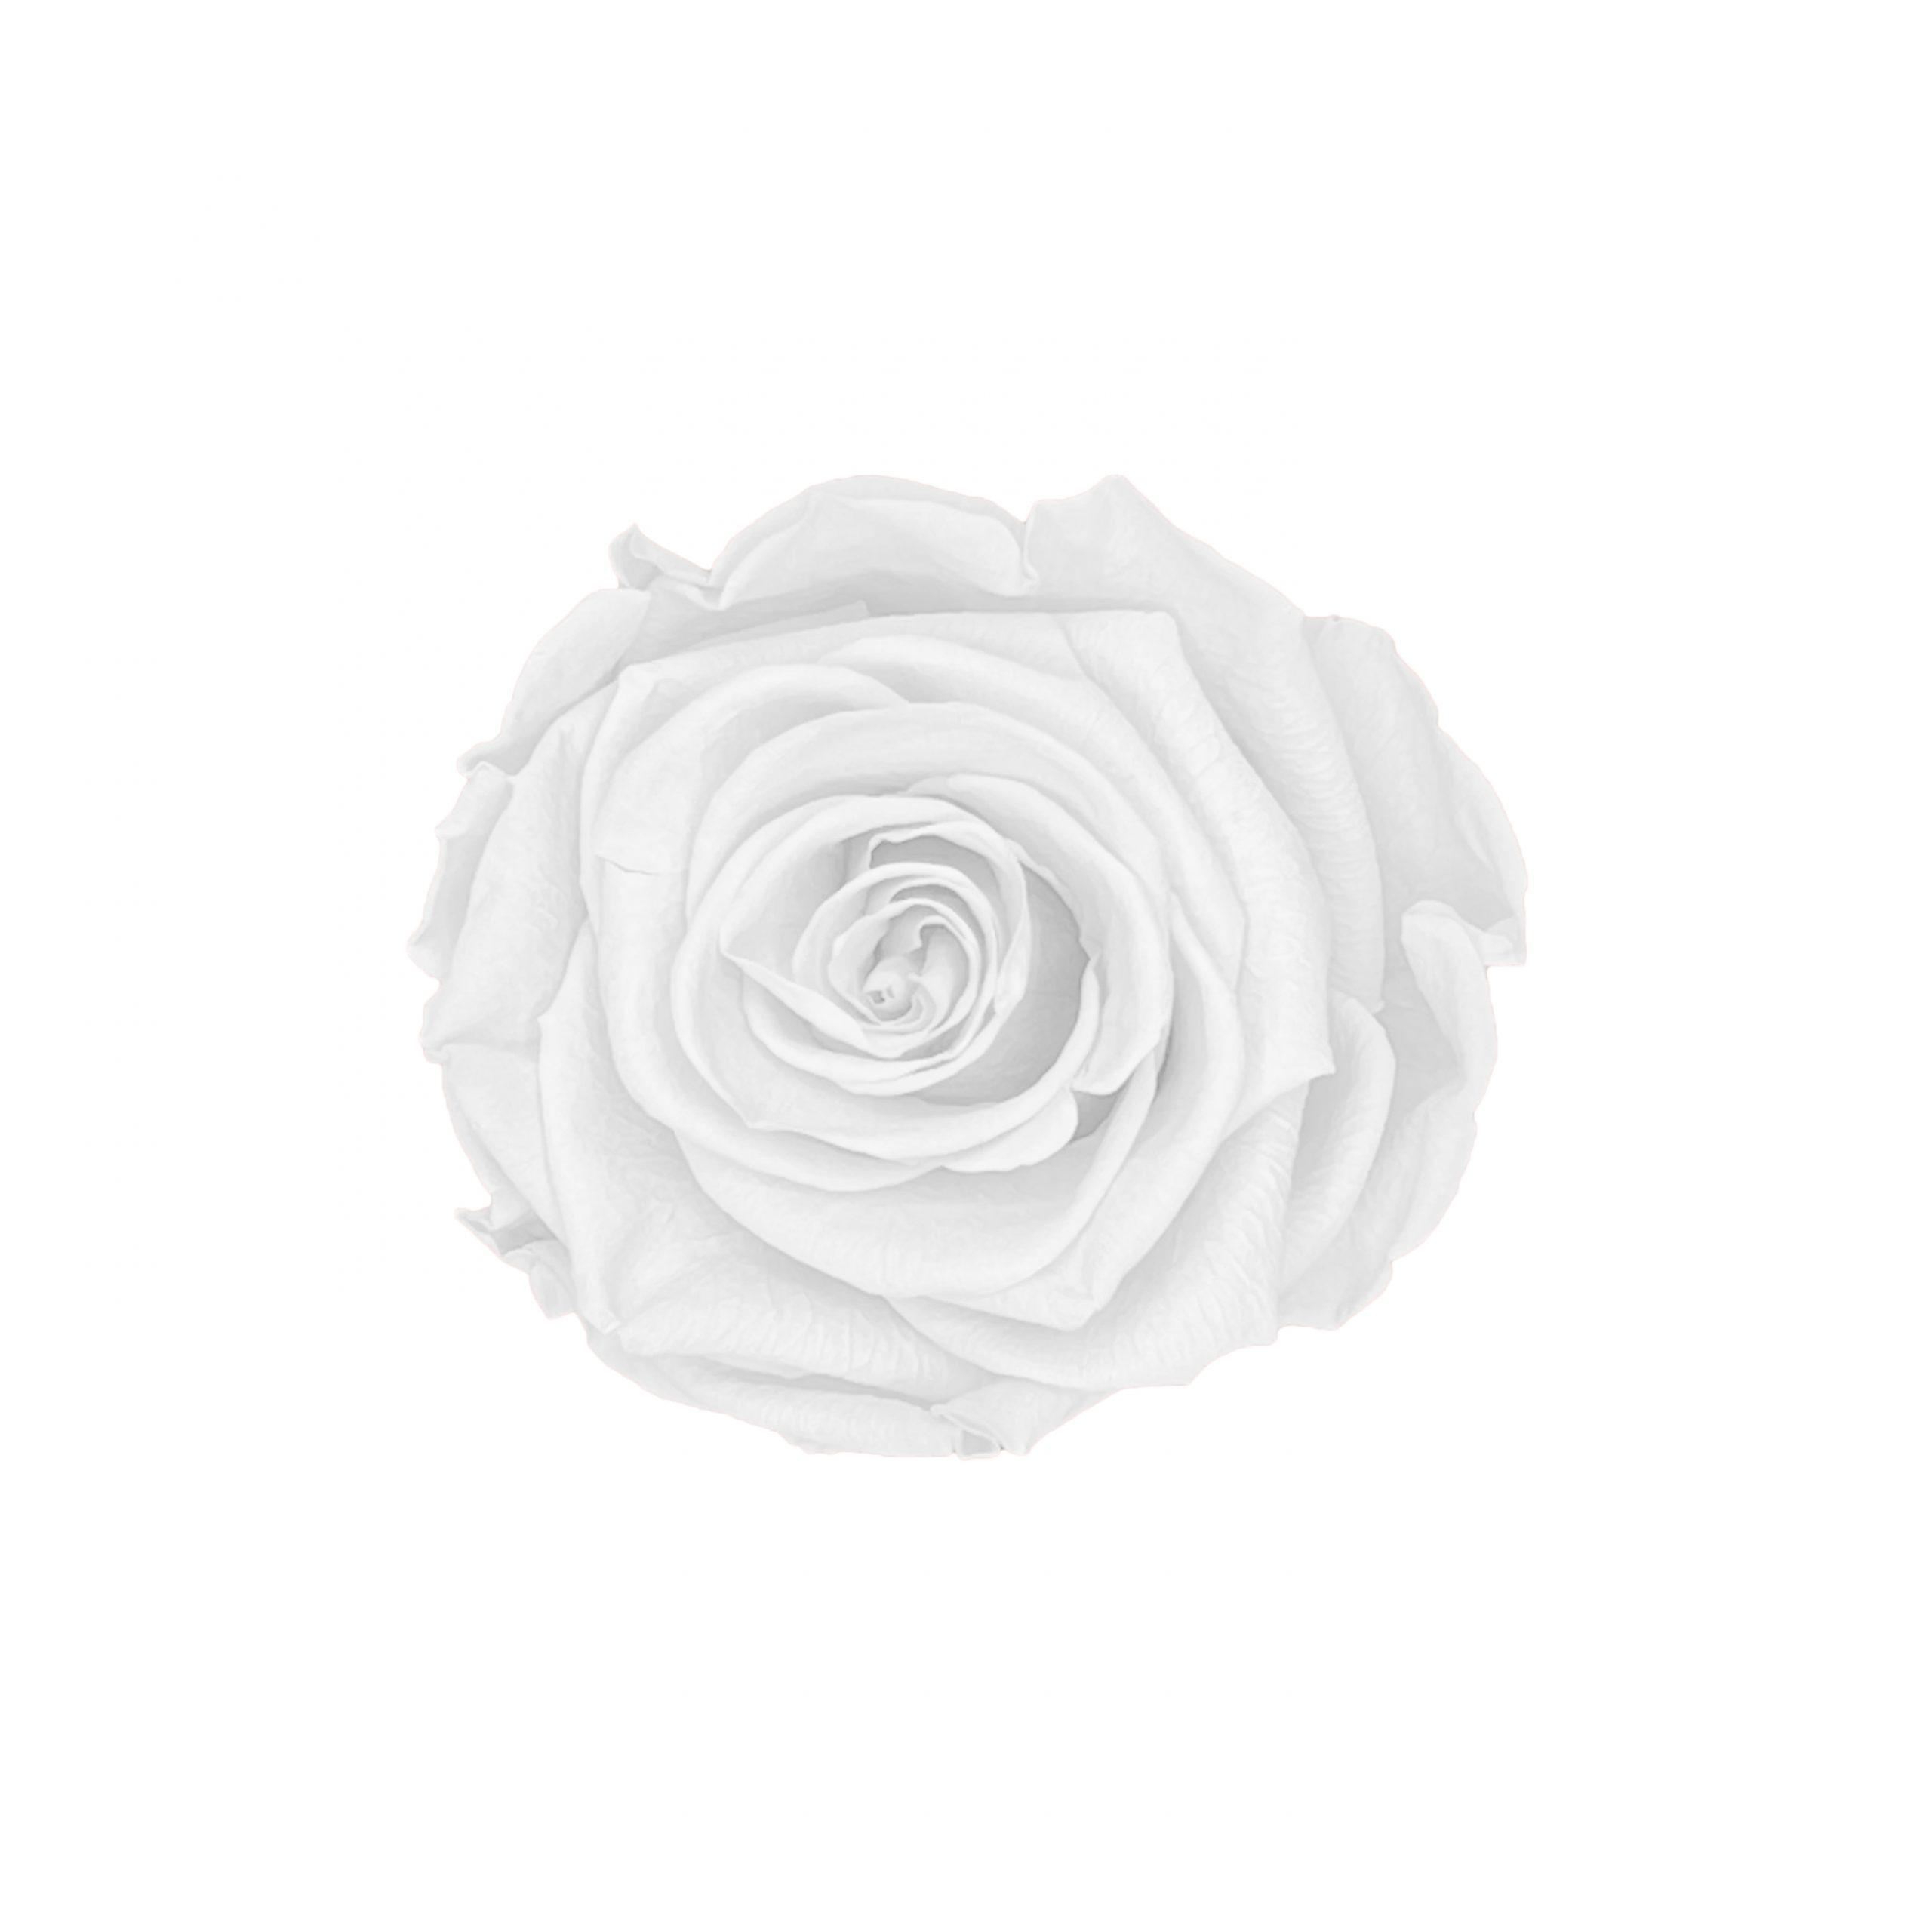 Infinity rose white